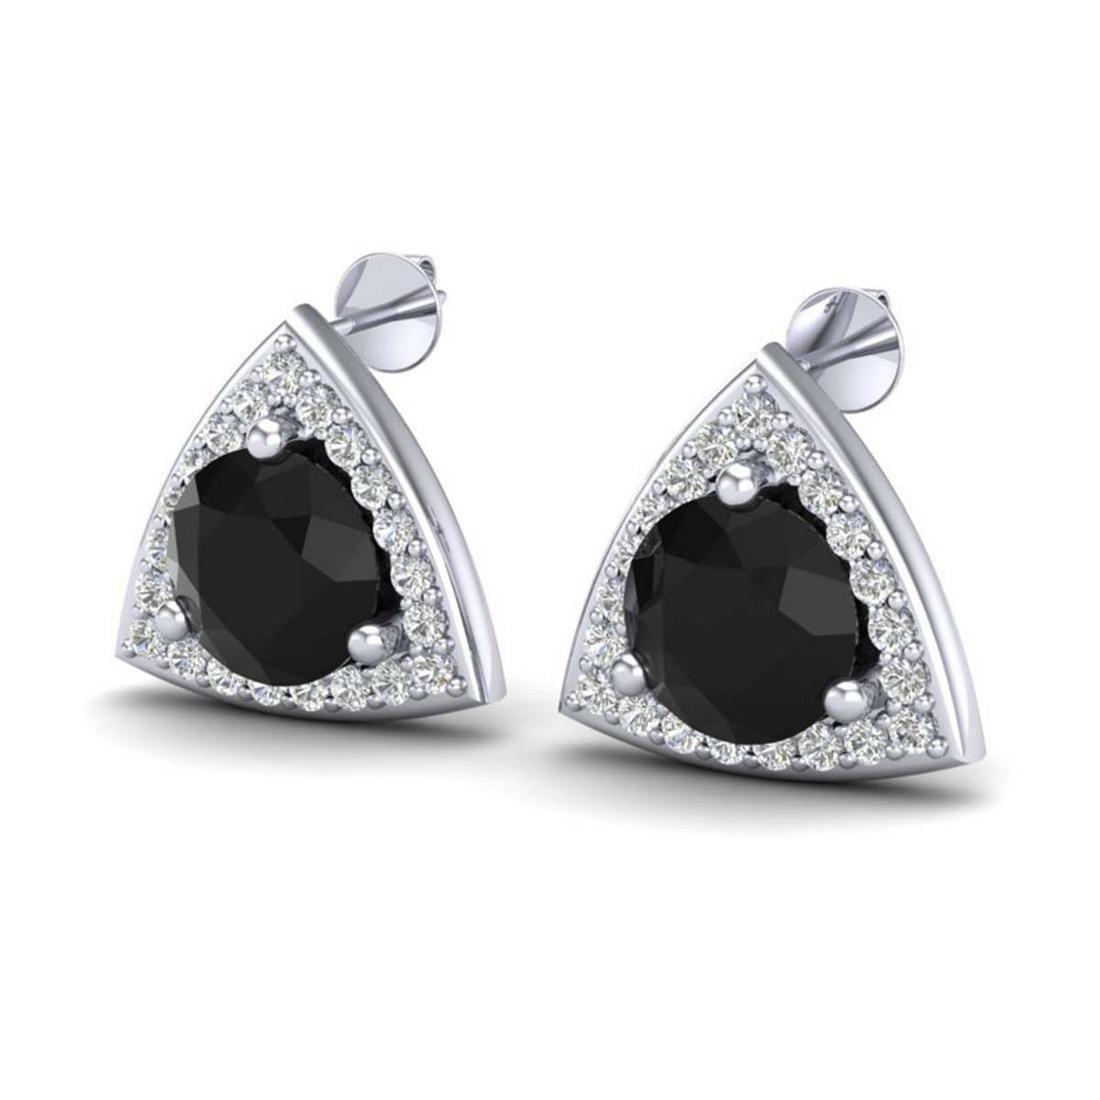 3.50 ctw Halo VS/SI Diamond Stud Earrings 18K White